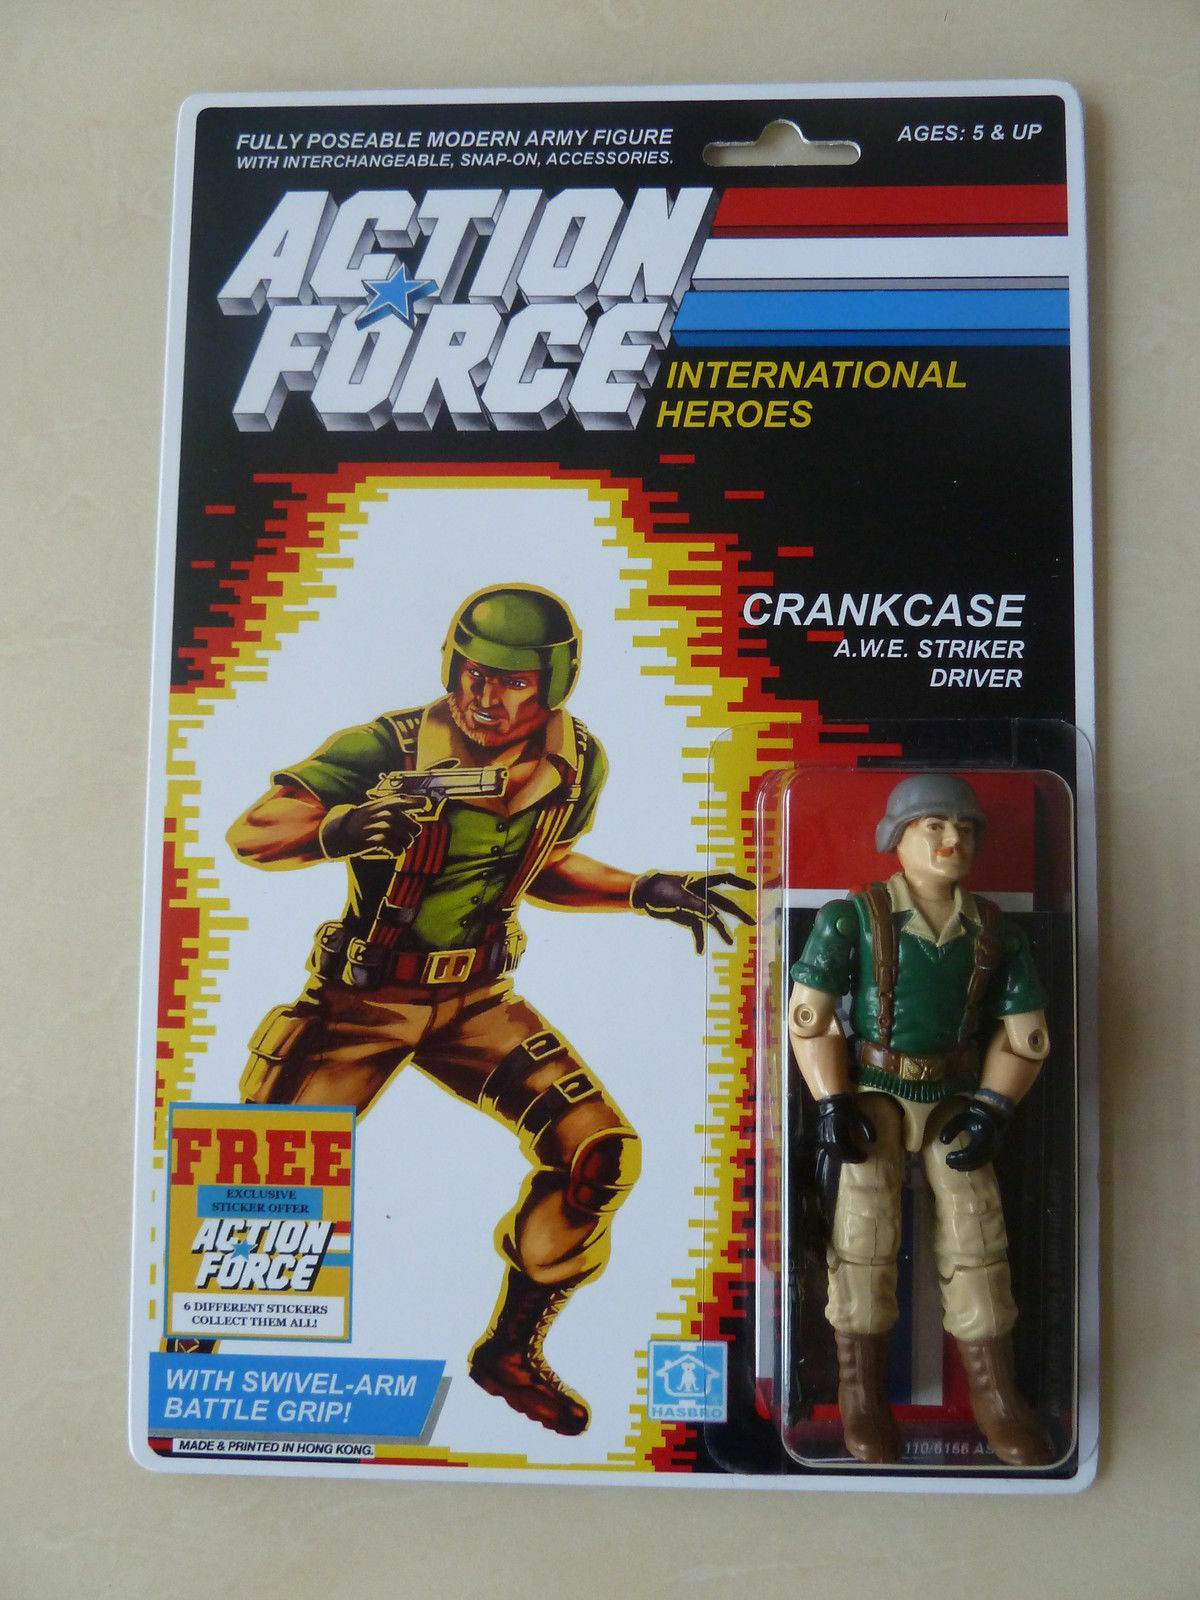 Fuerza de acción Gi Joe del cárter a.w.e controlador Moc Cochedada Personalizado Pegatina Oferta